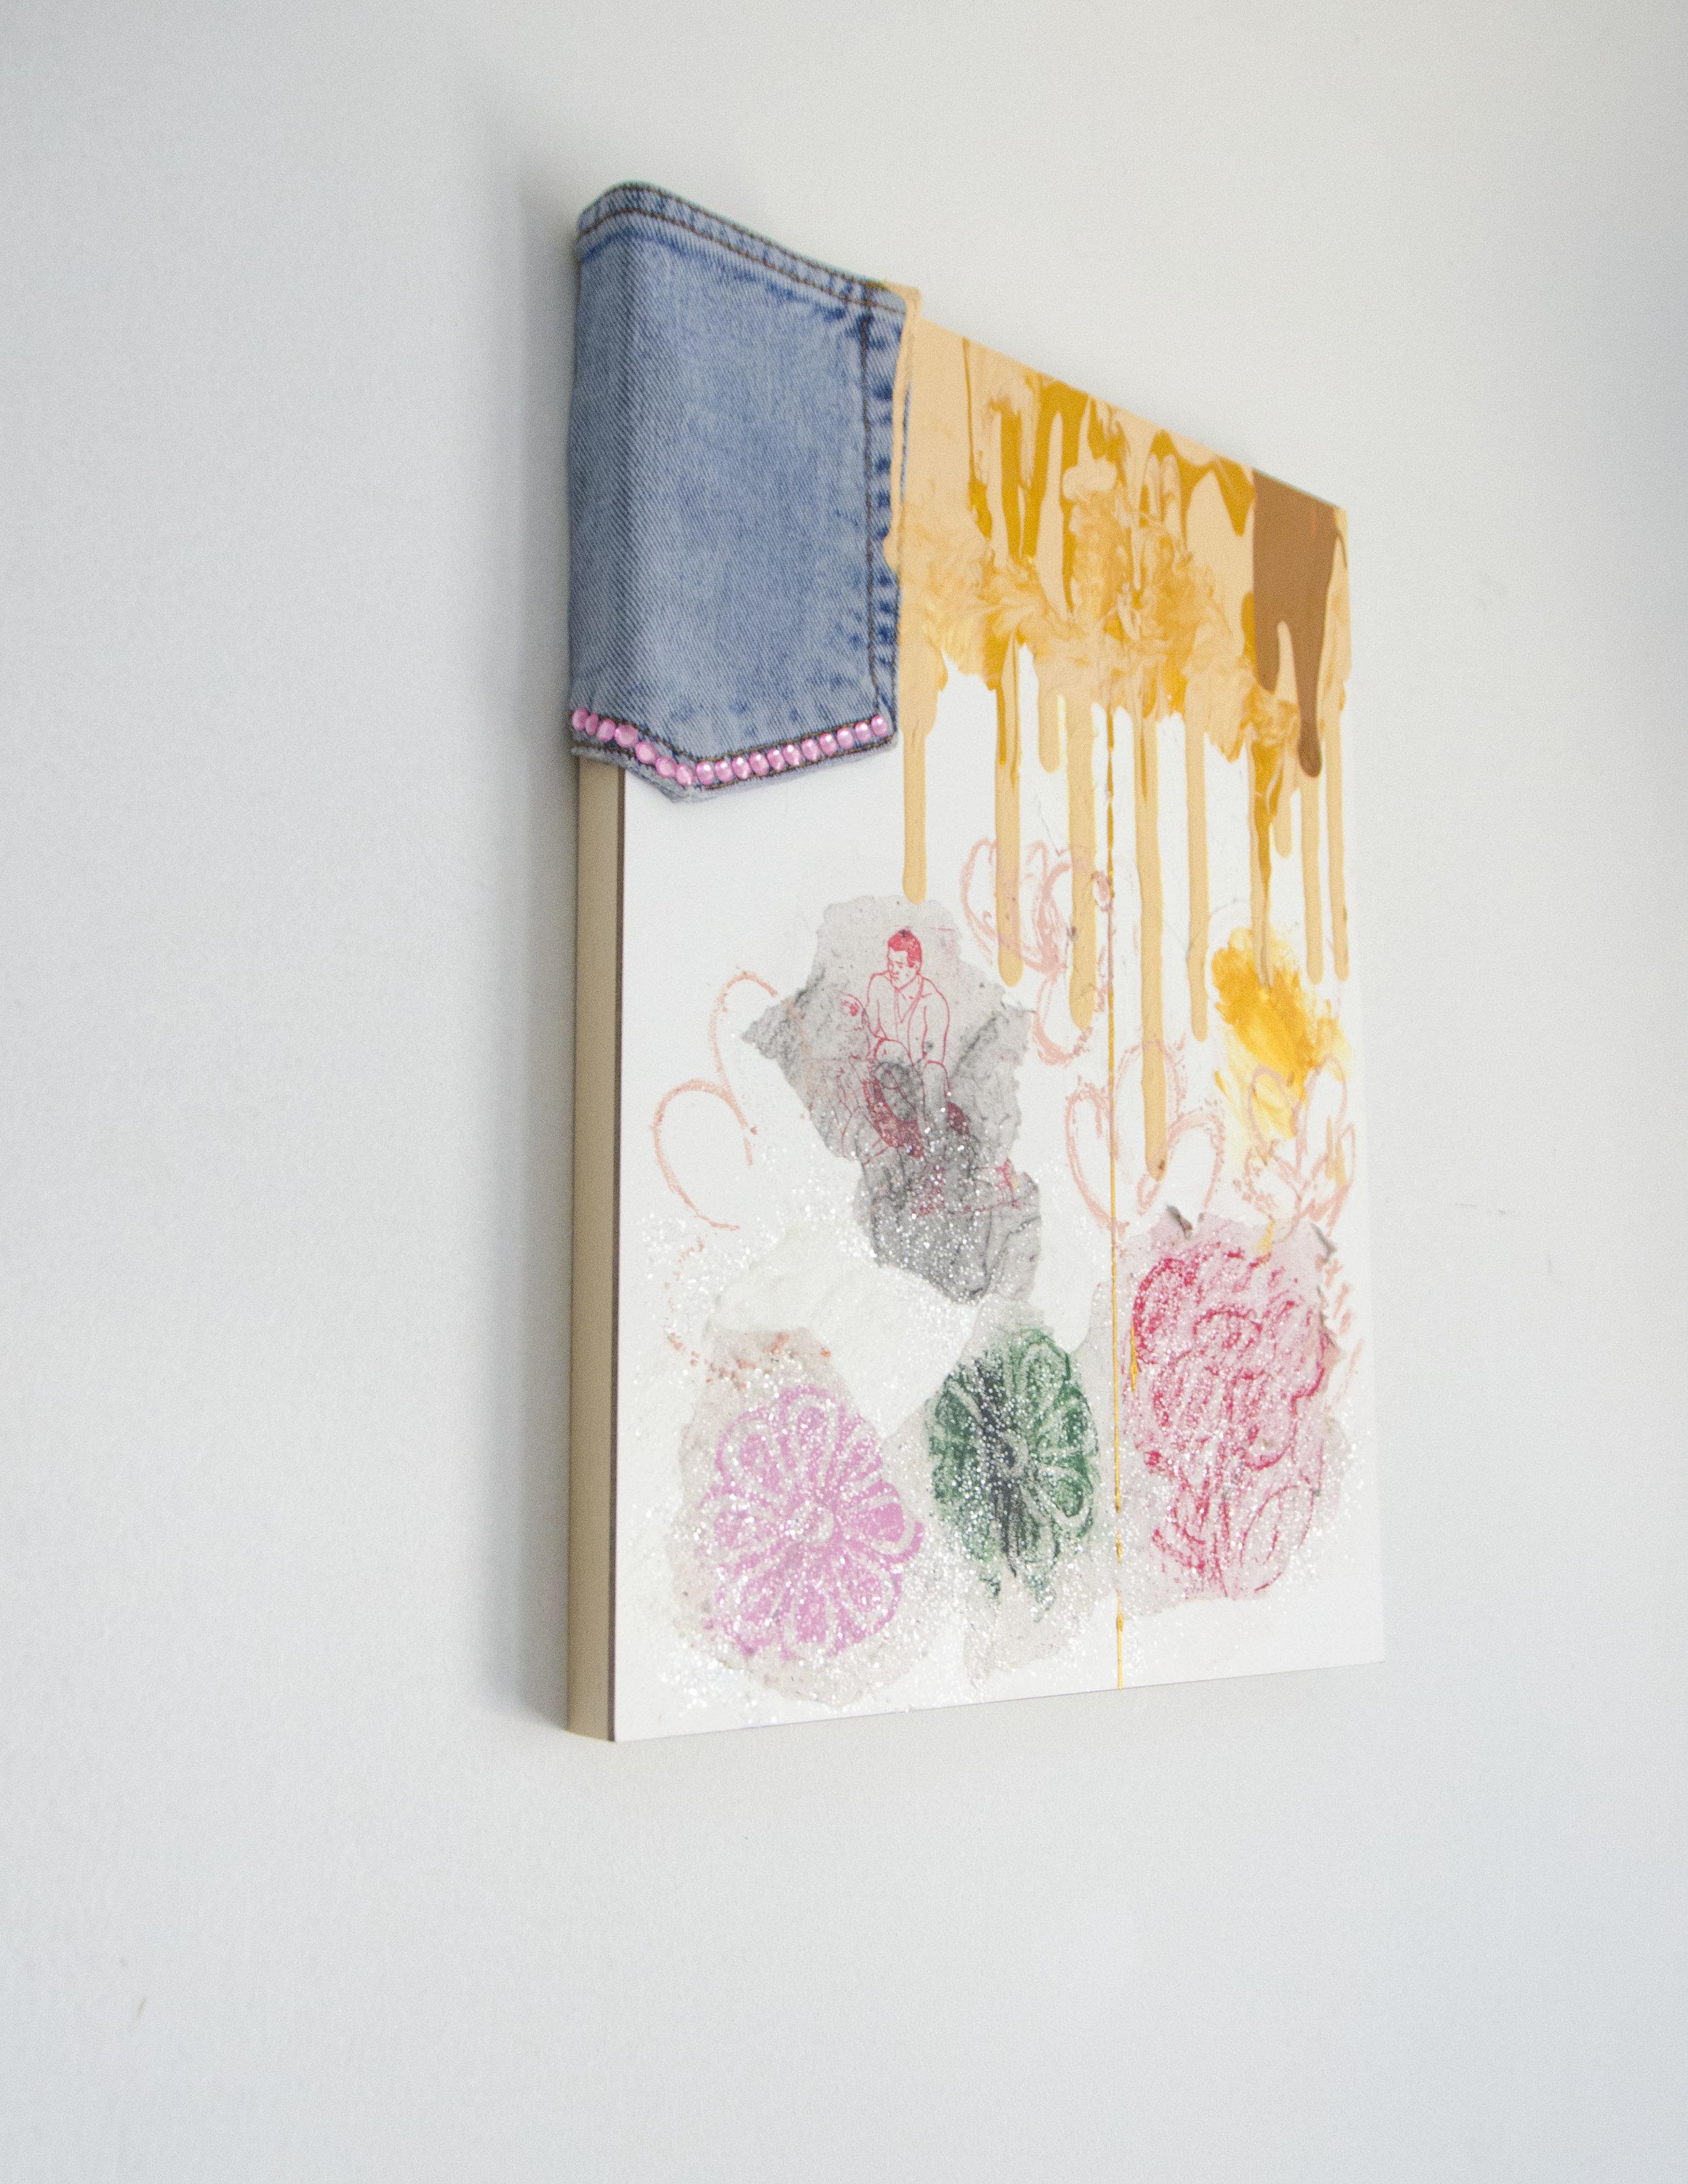 We Three Kings( Well, seeking our third)  (Detail)  2018  Acrylic, ink, pastel, denim, rhinestones, and glitter, on panel